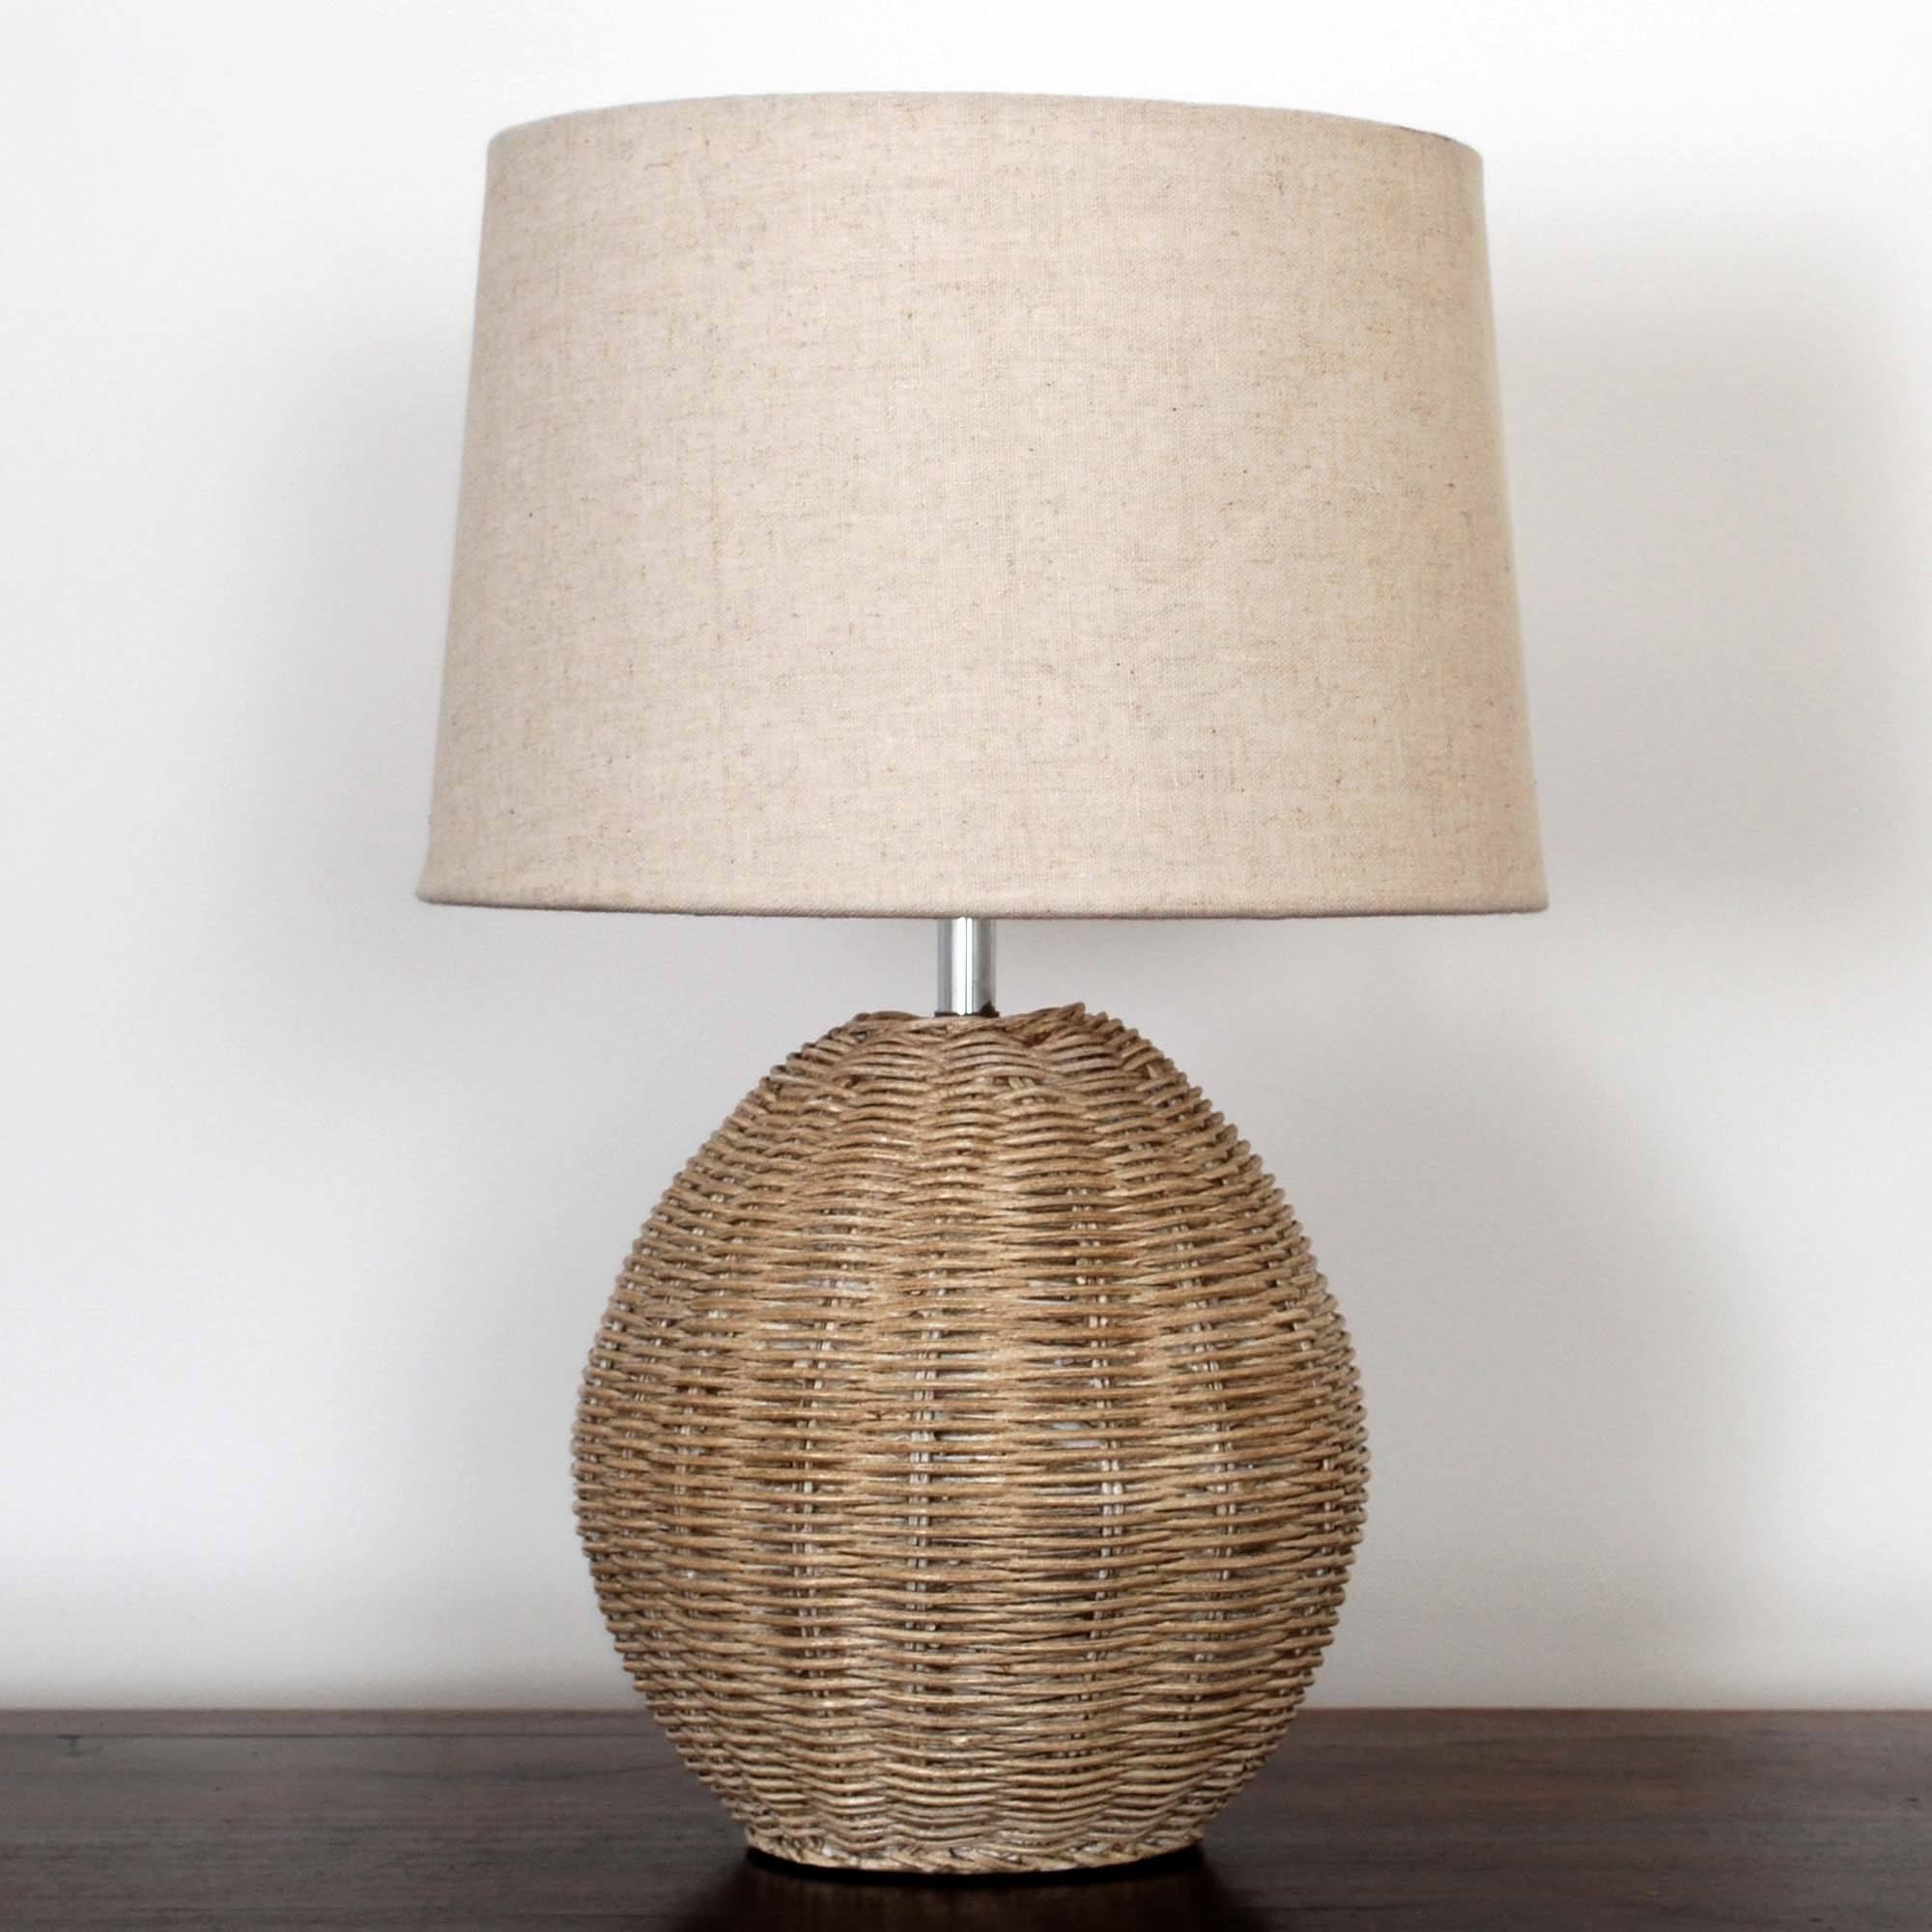 Photo of Ali rattan table lamp light brown / natural